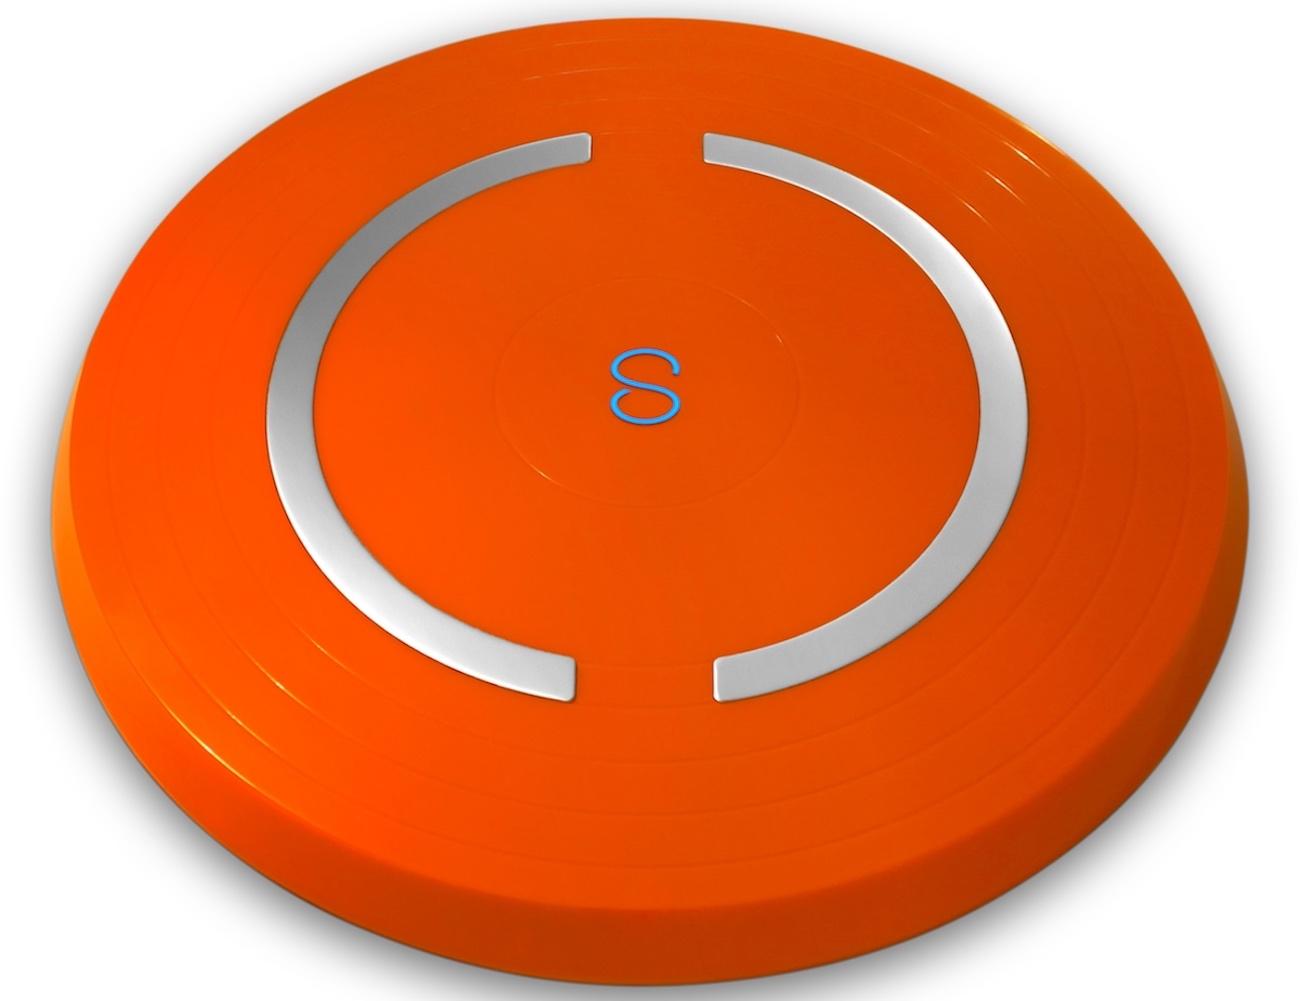 Shapa Intuitive Smart Scale